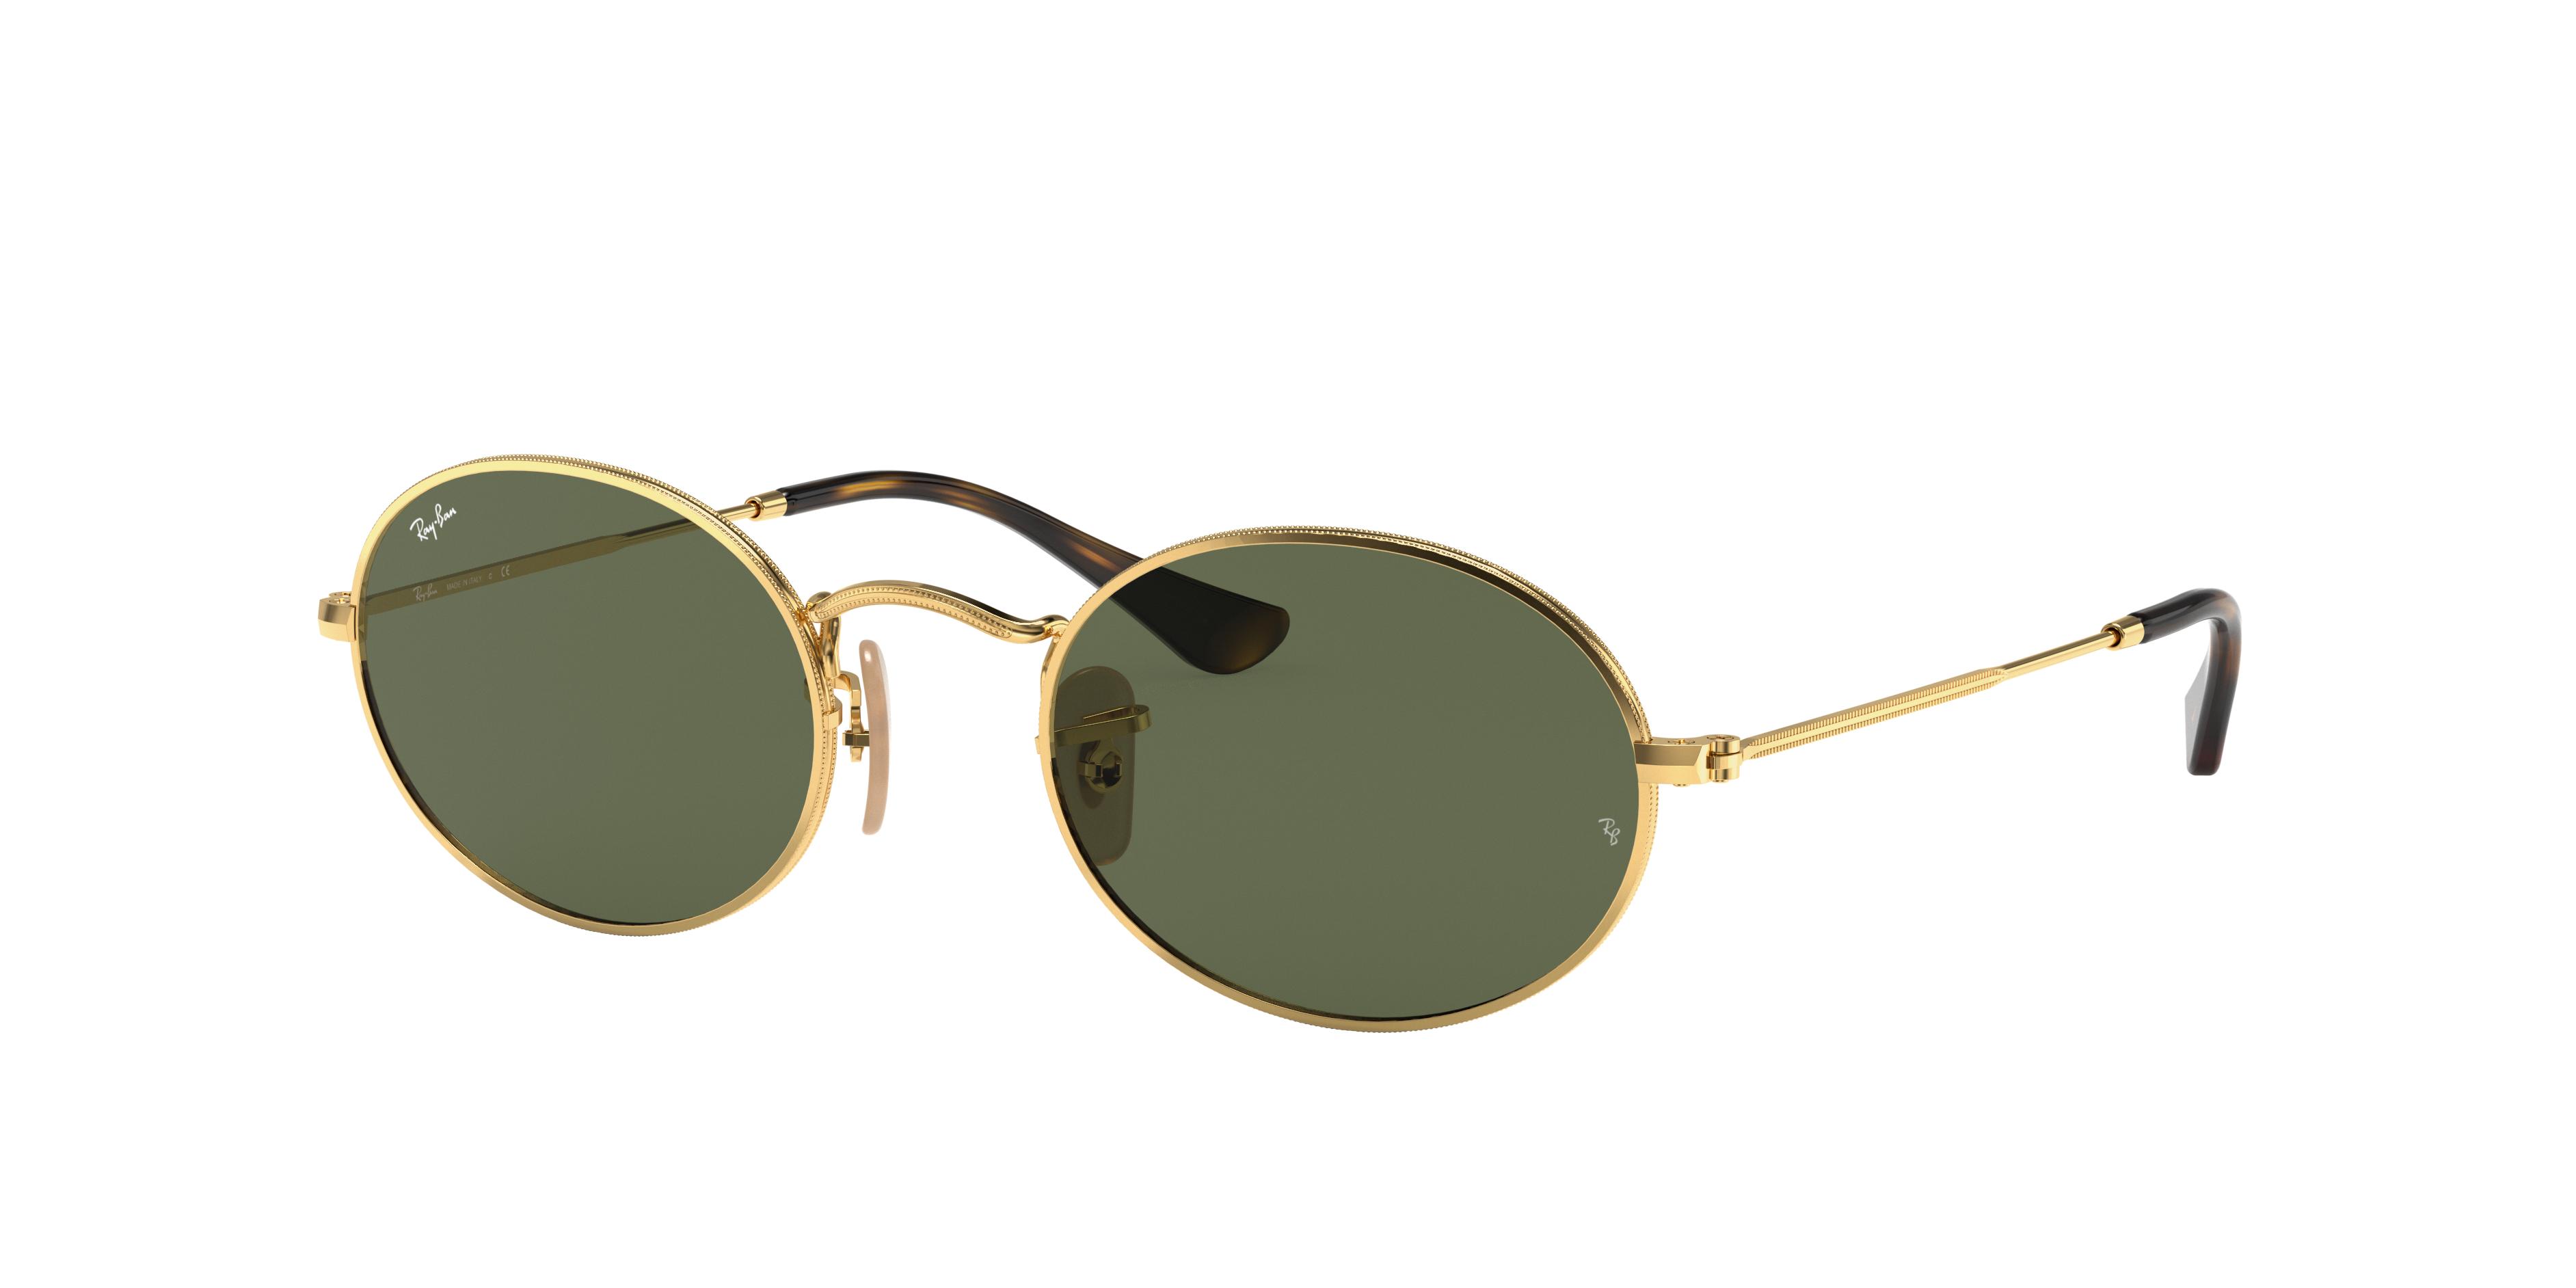 Ray-Ban Oval Flat Lenses Gold, Green Lenses - RB3547N